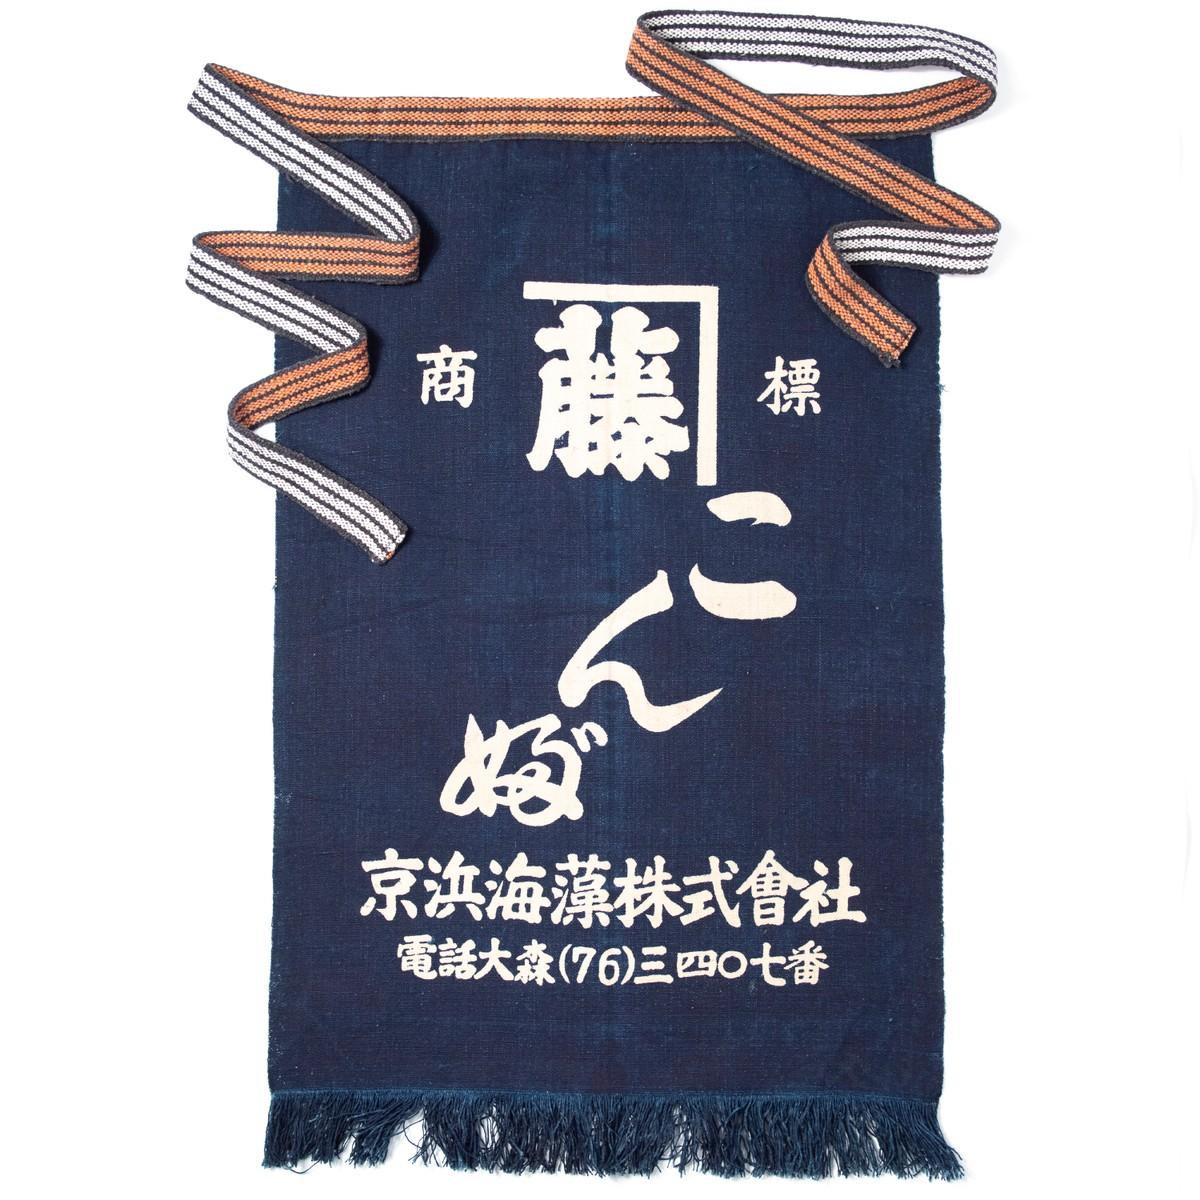 Photo of Vintage Maekake Apron: Seaweed Wholesaler